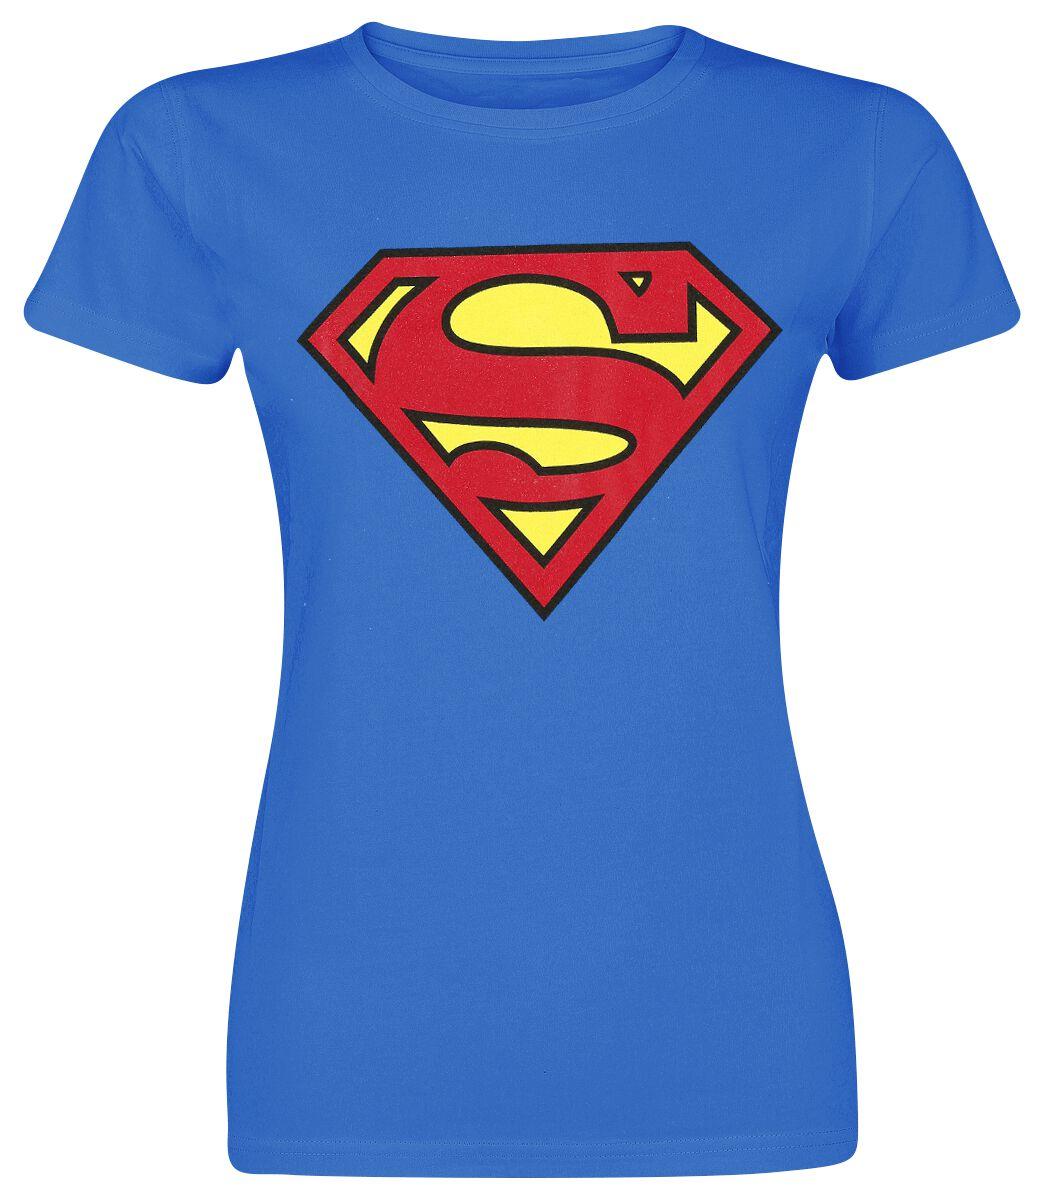 Merch dla Fanów - Koszulki - Koszulka damska Superman Logo Koszulka damska niebieski - 274708